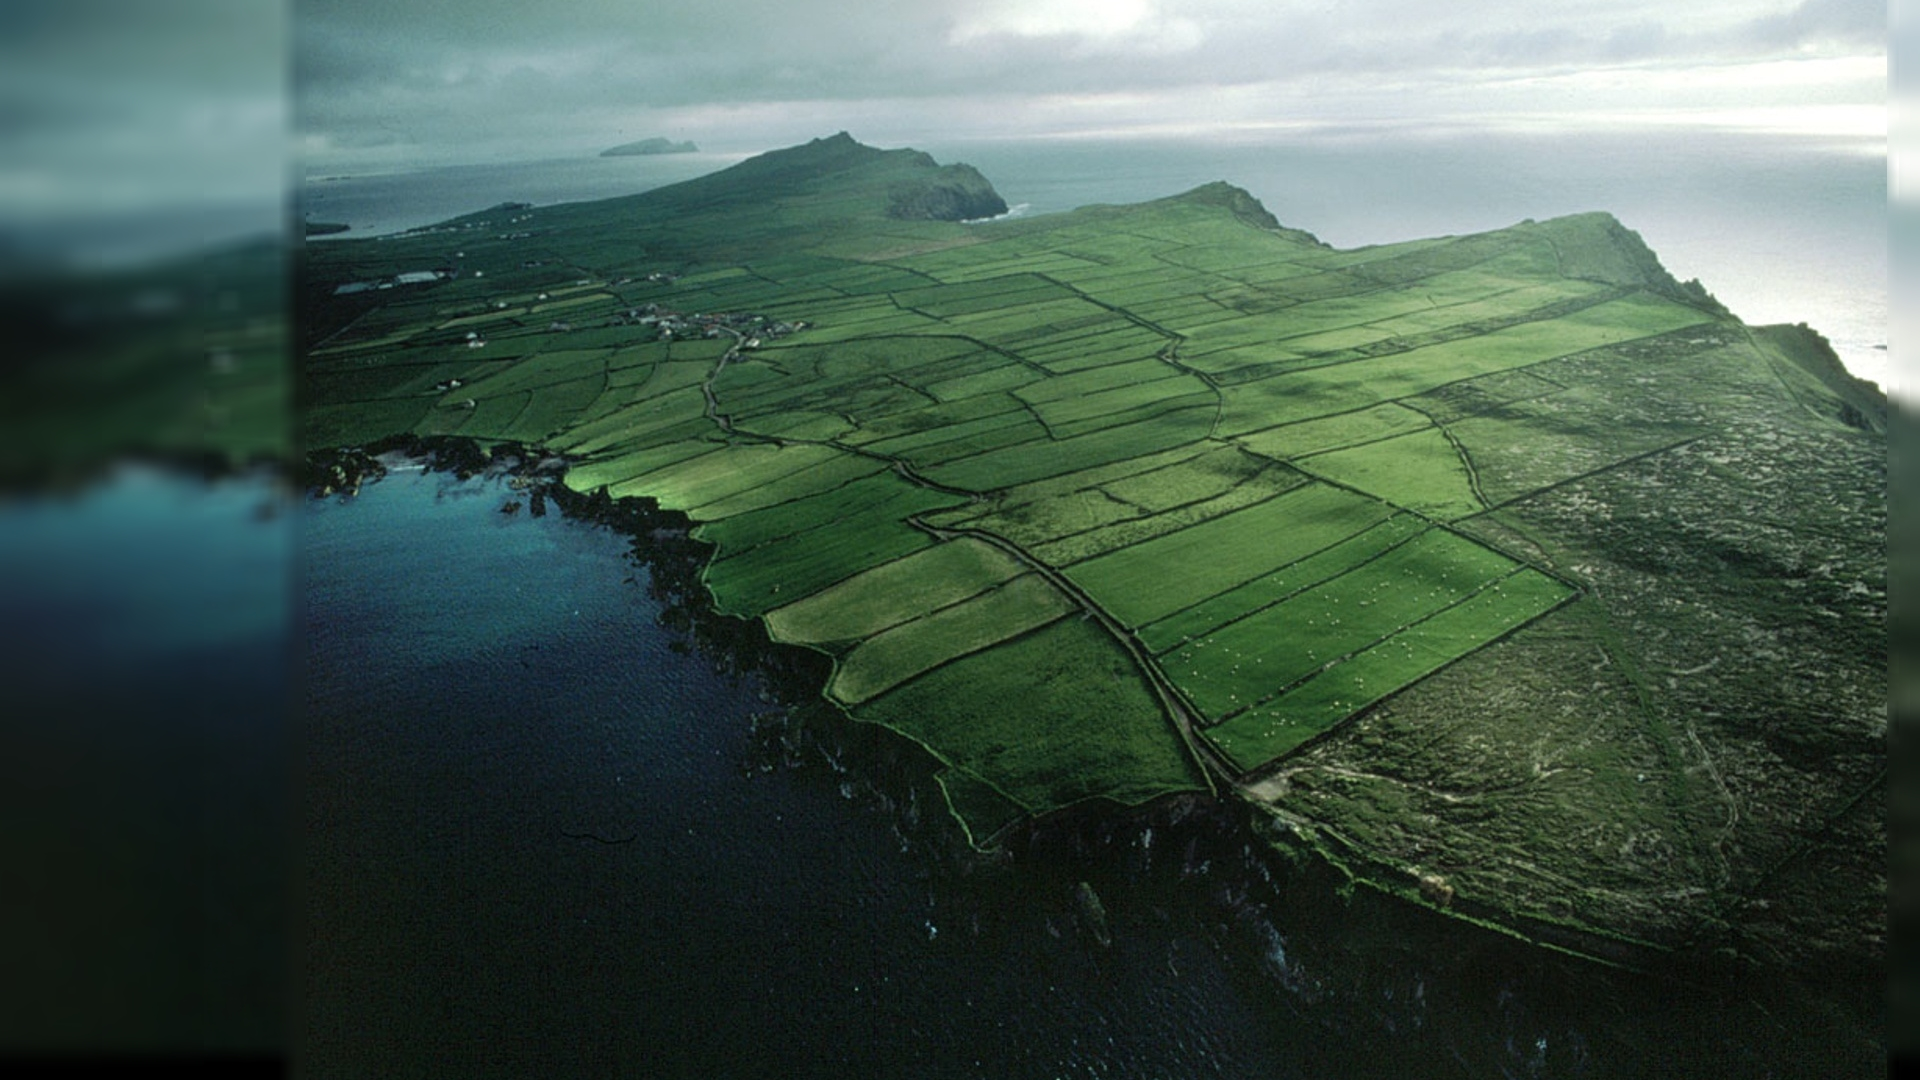 Irish wallpaper 1920x1080 53428 1920x1080